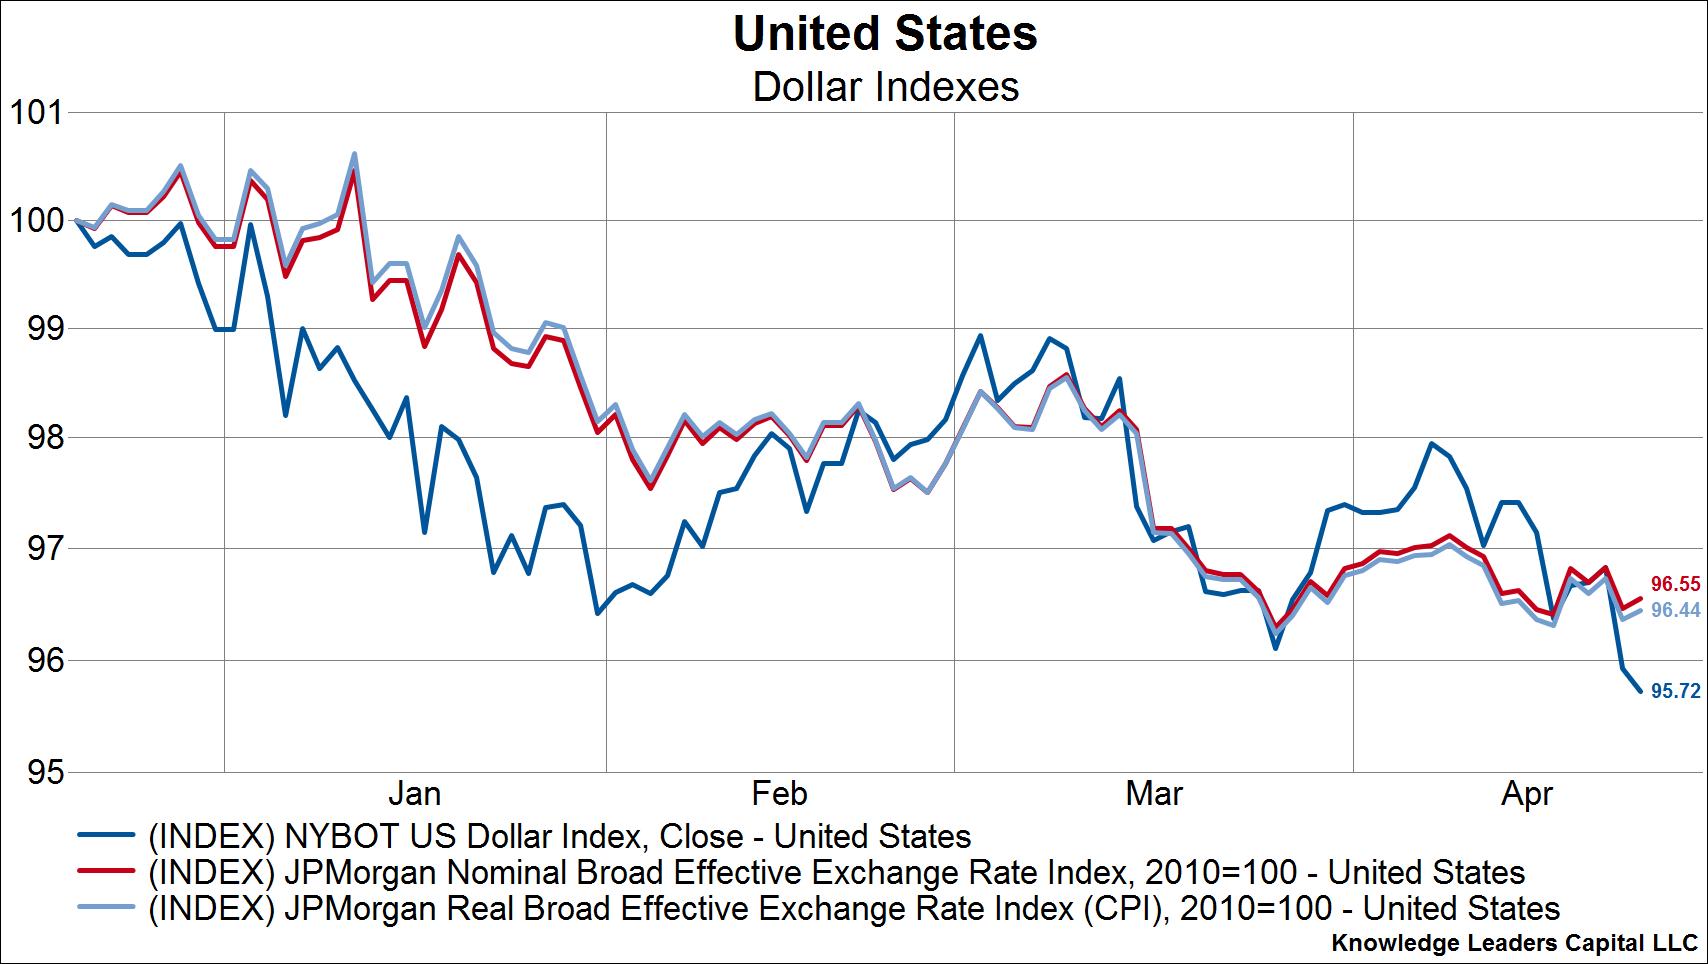 GO IN-DEPTH ON U.S. Dollar Index